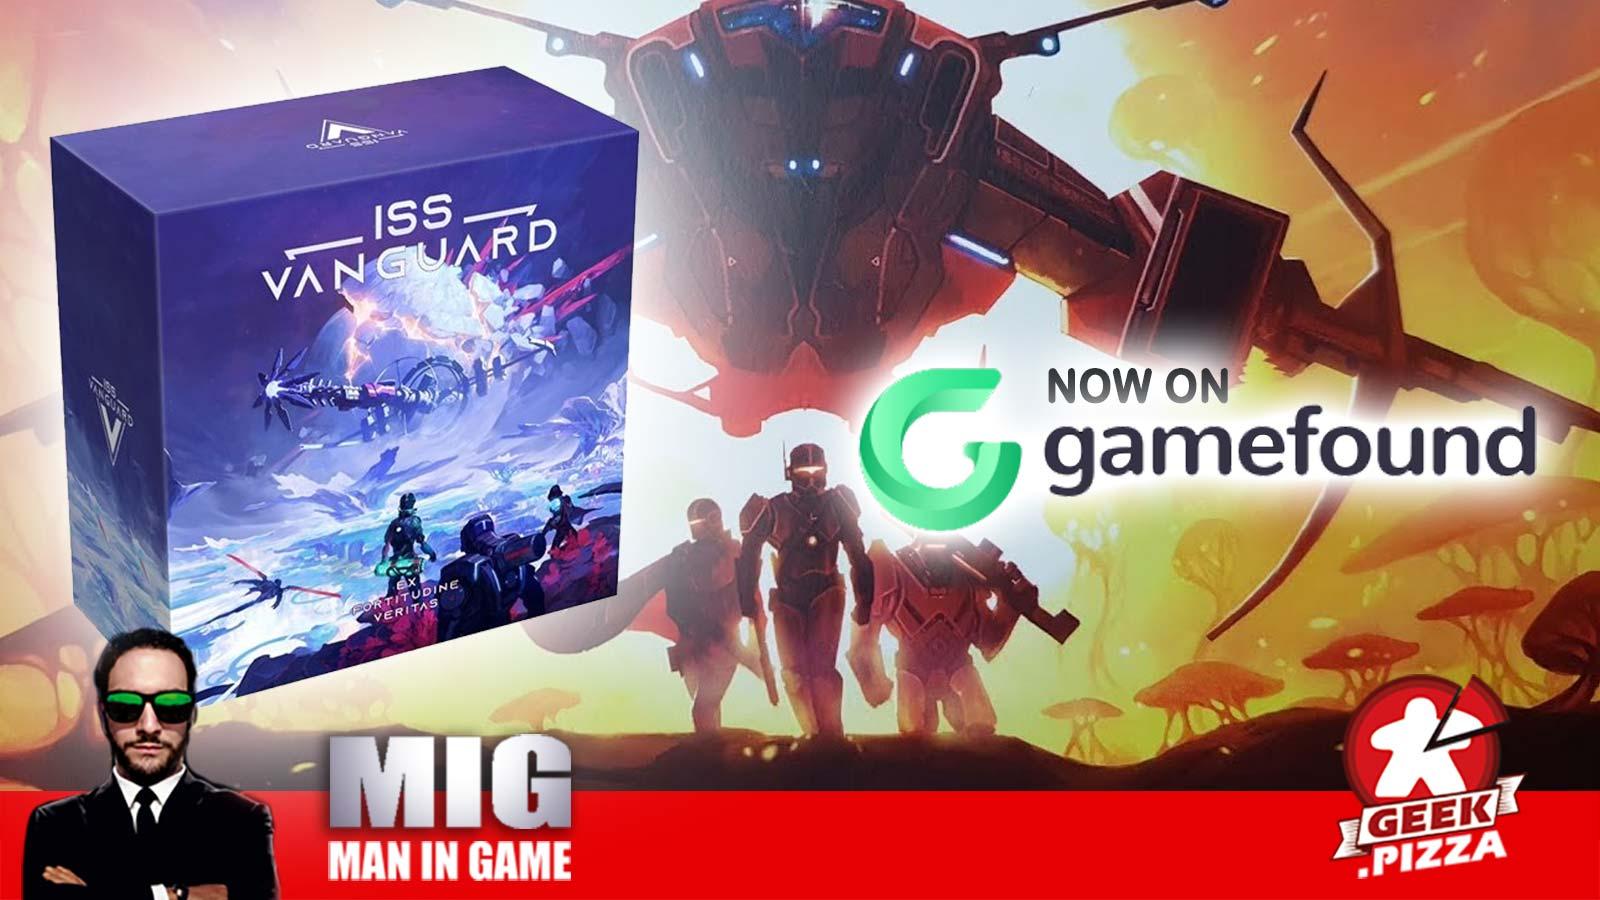 ISS Vanguard, novità Kickstarter? No, Gamefound!